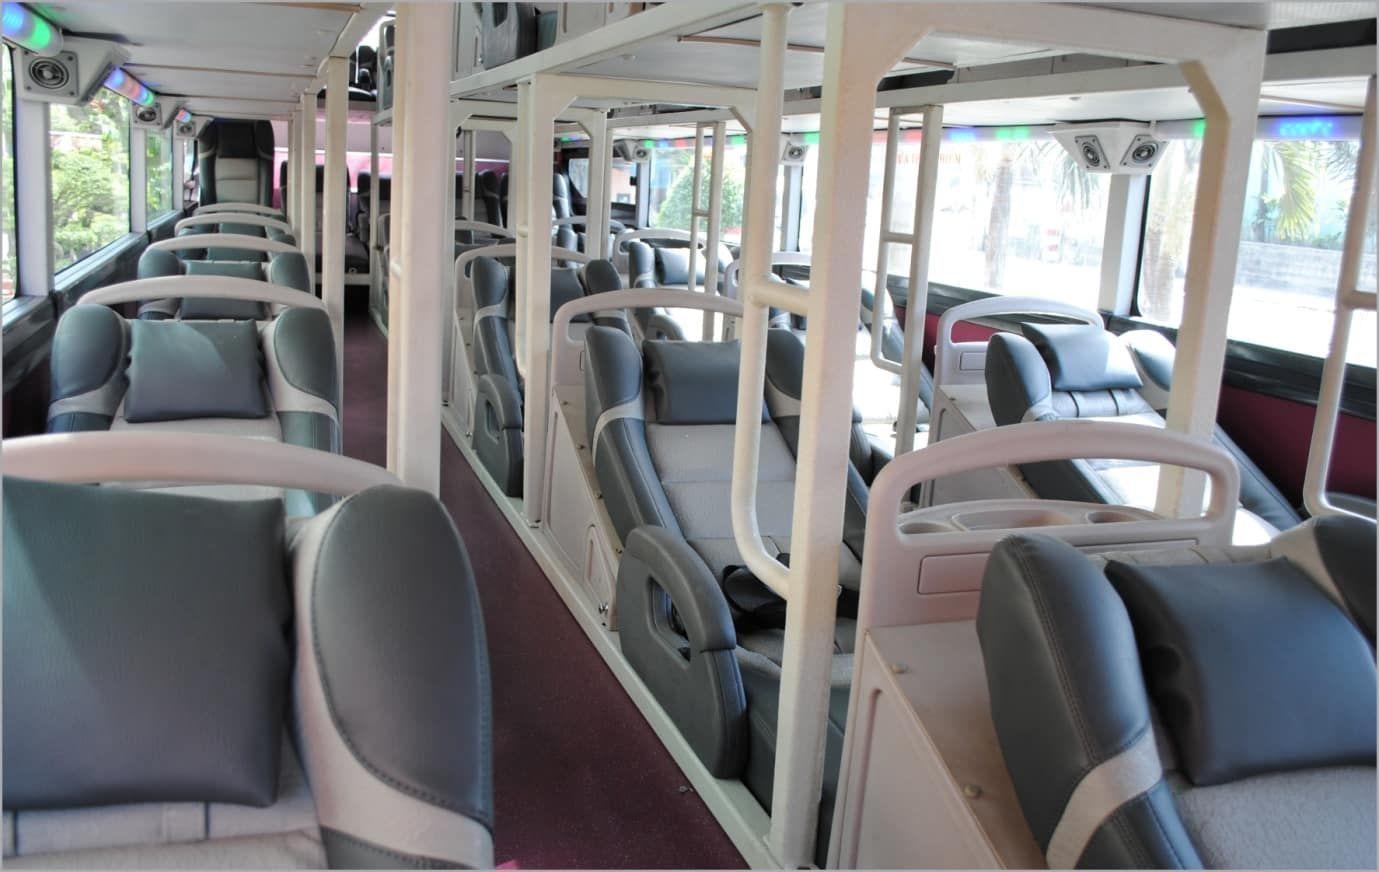 Phuong Trang Limousine 2 30 01 2020